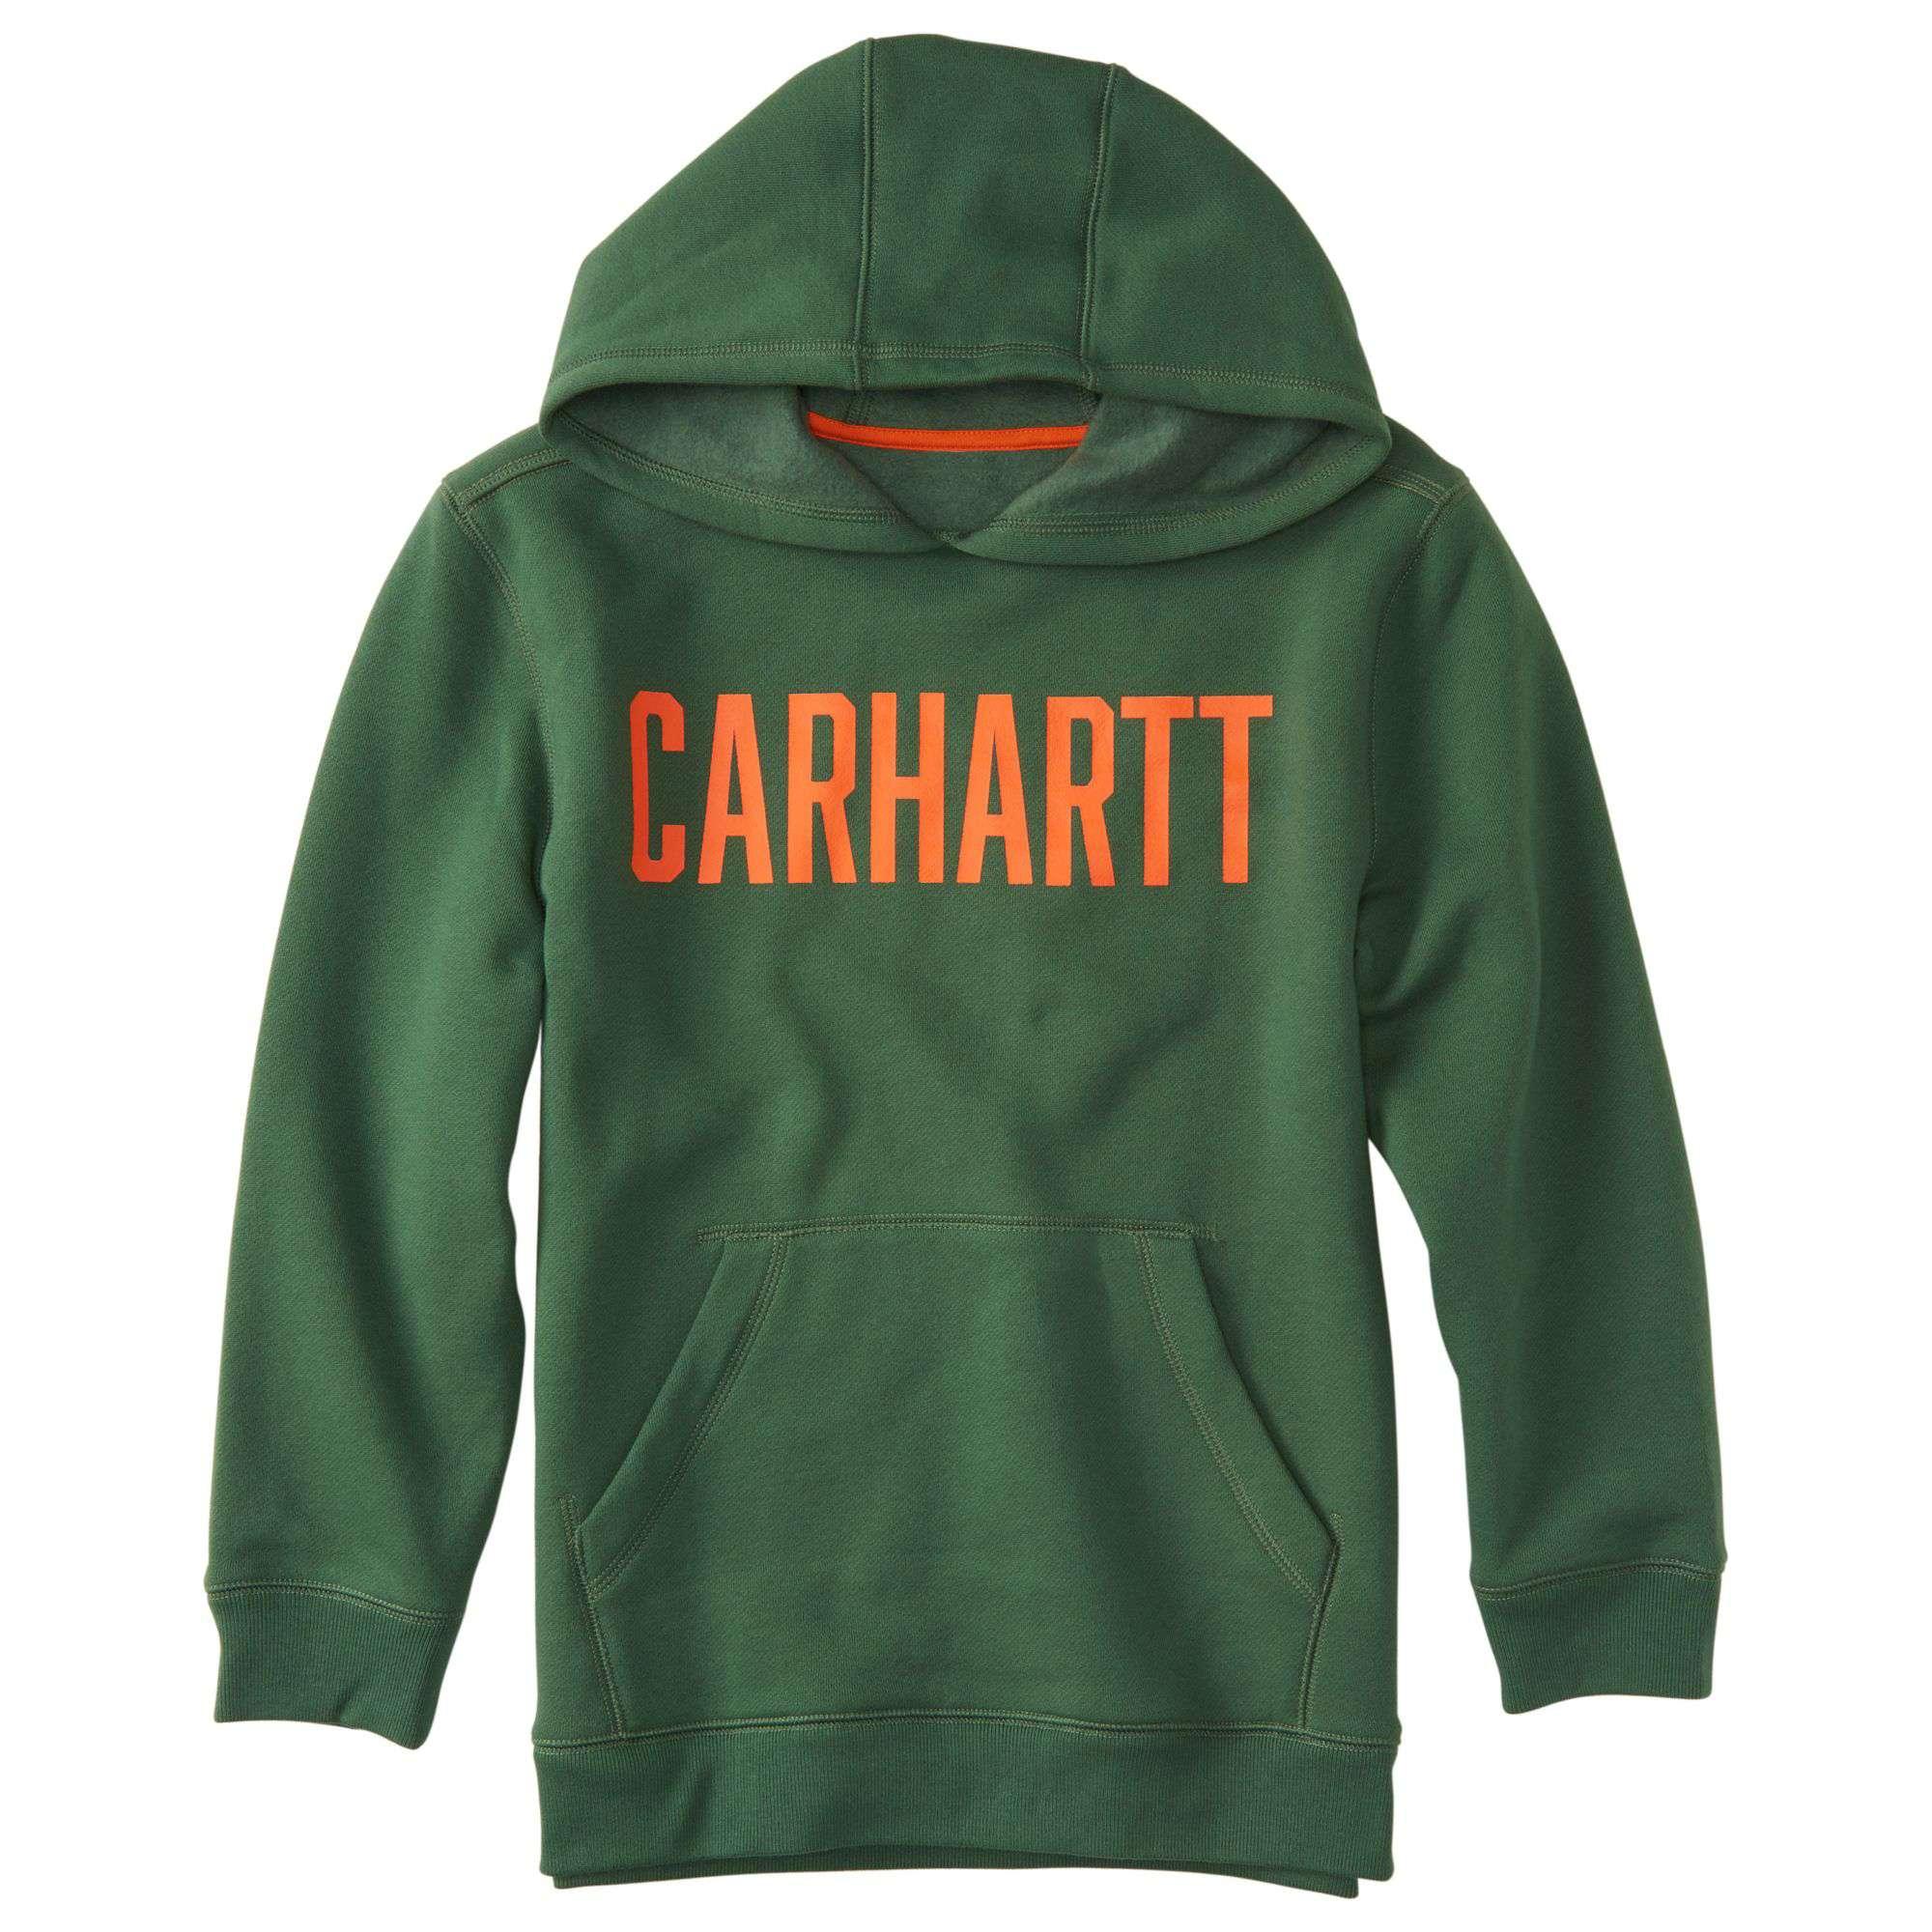 Carhartt Block Sweatshirt